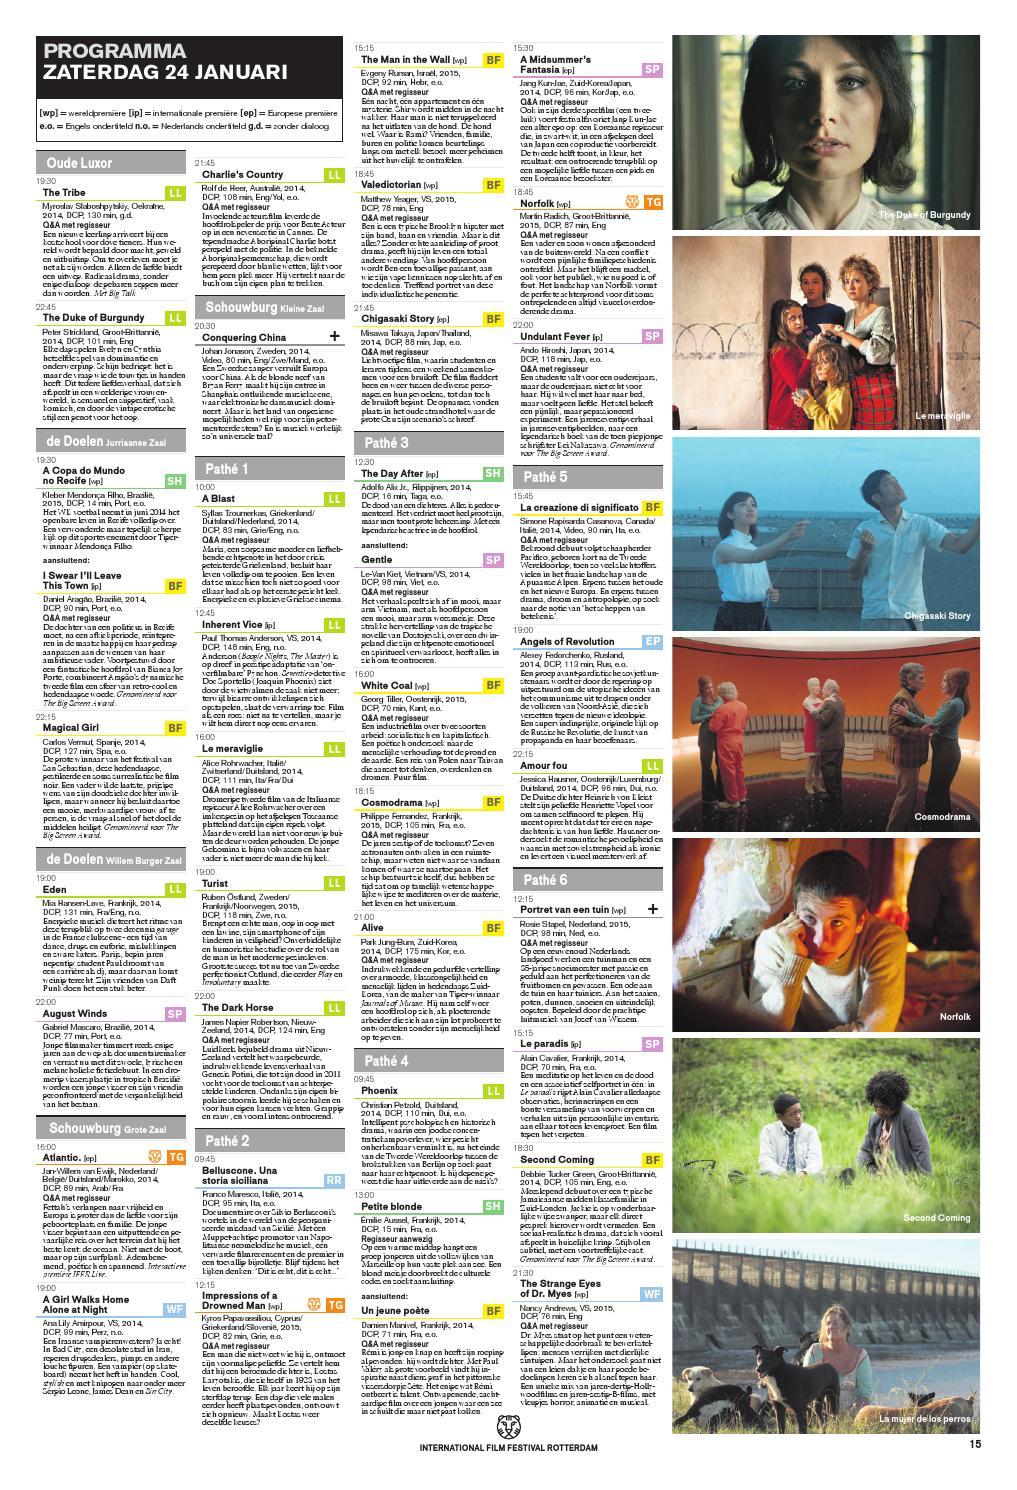 Daily Tiger 3 By International Film Festival Rotterdam Issuu